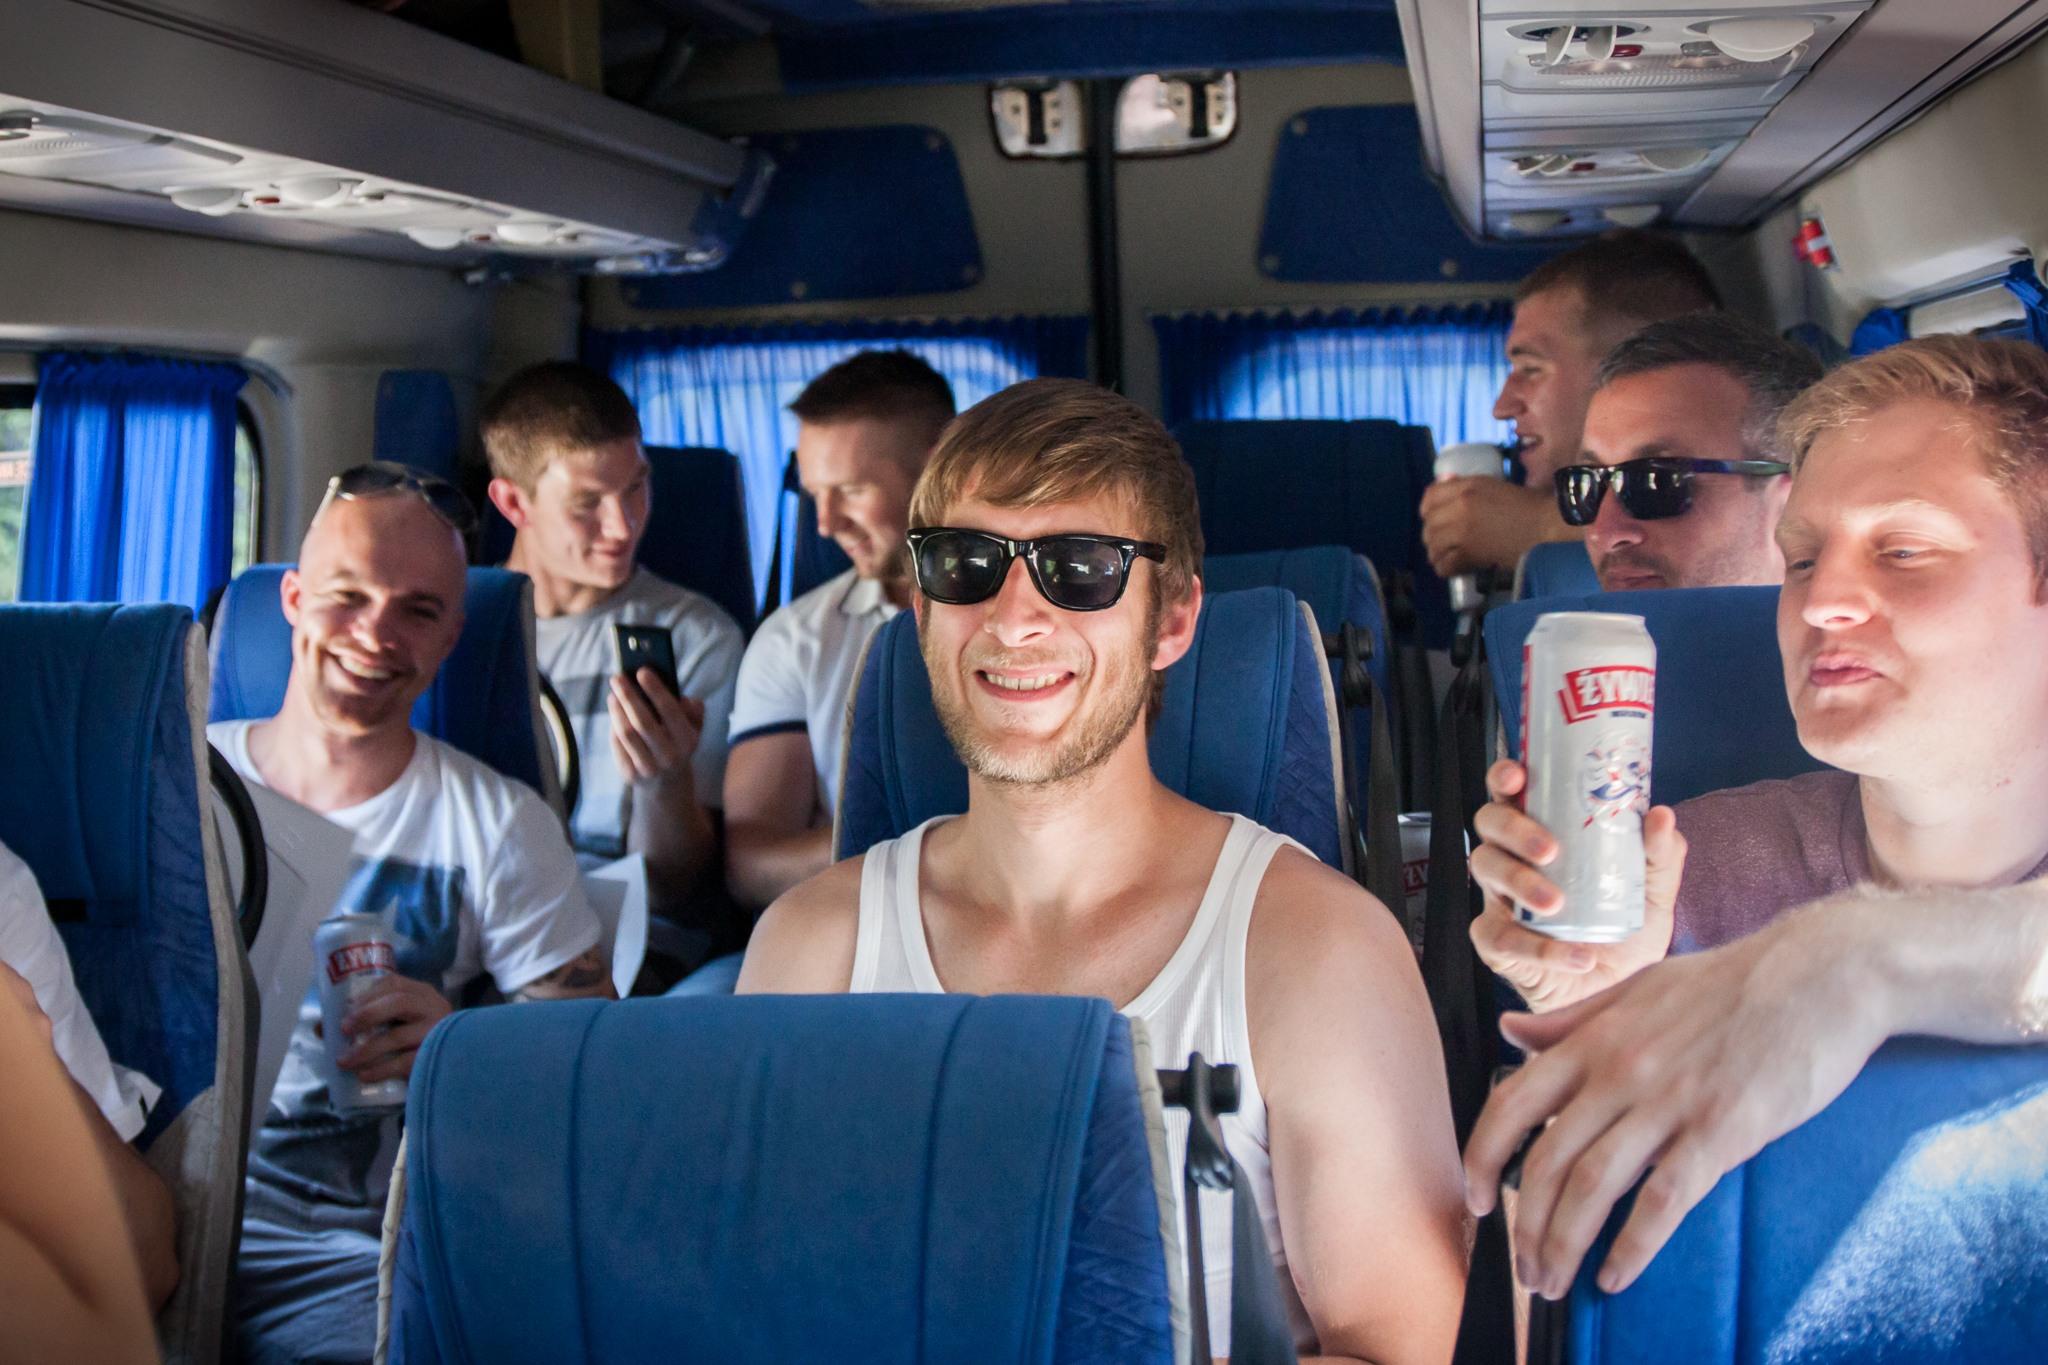 STag do Katowice airport transfers to Krakow